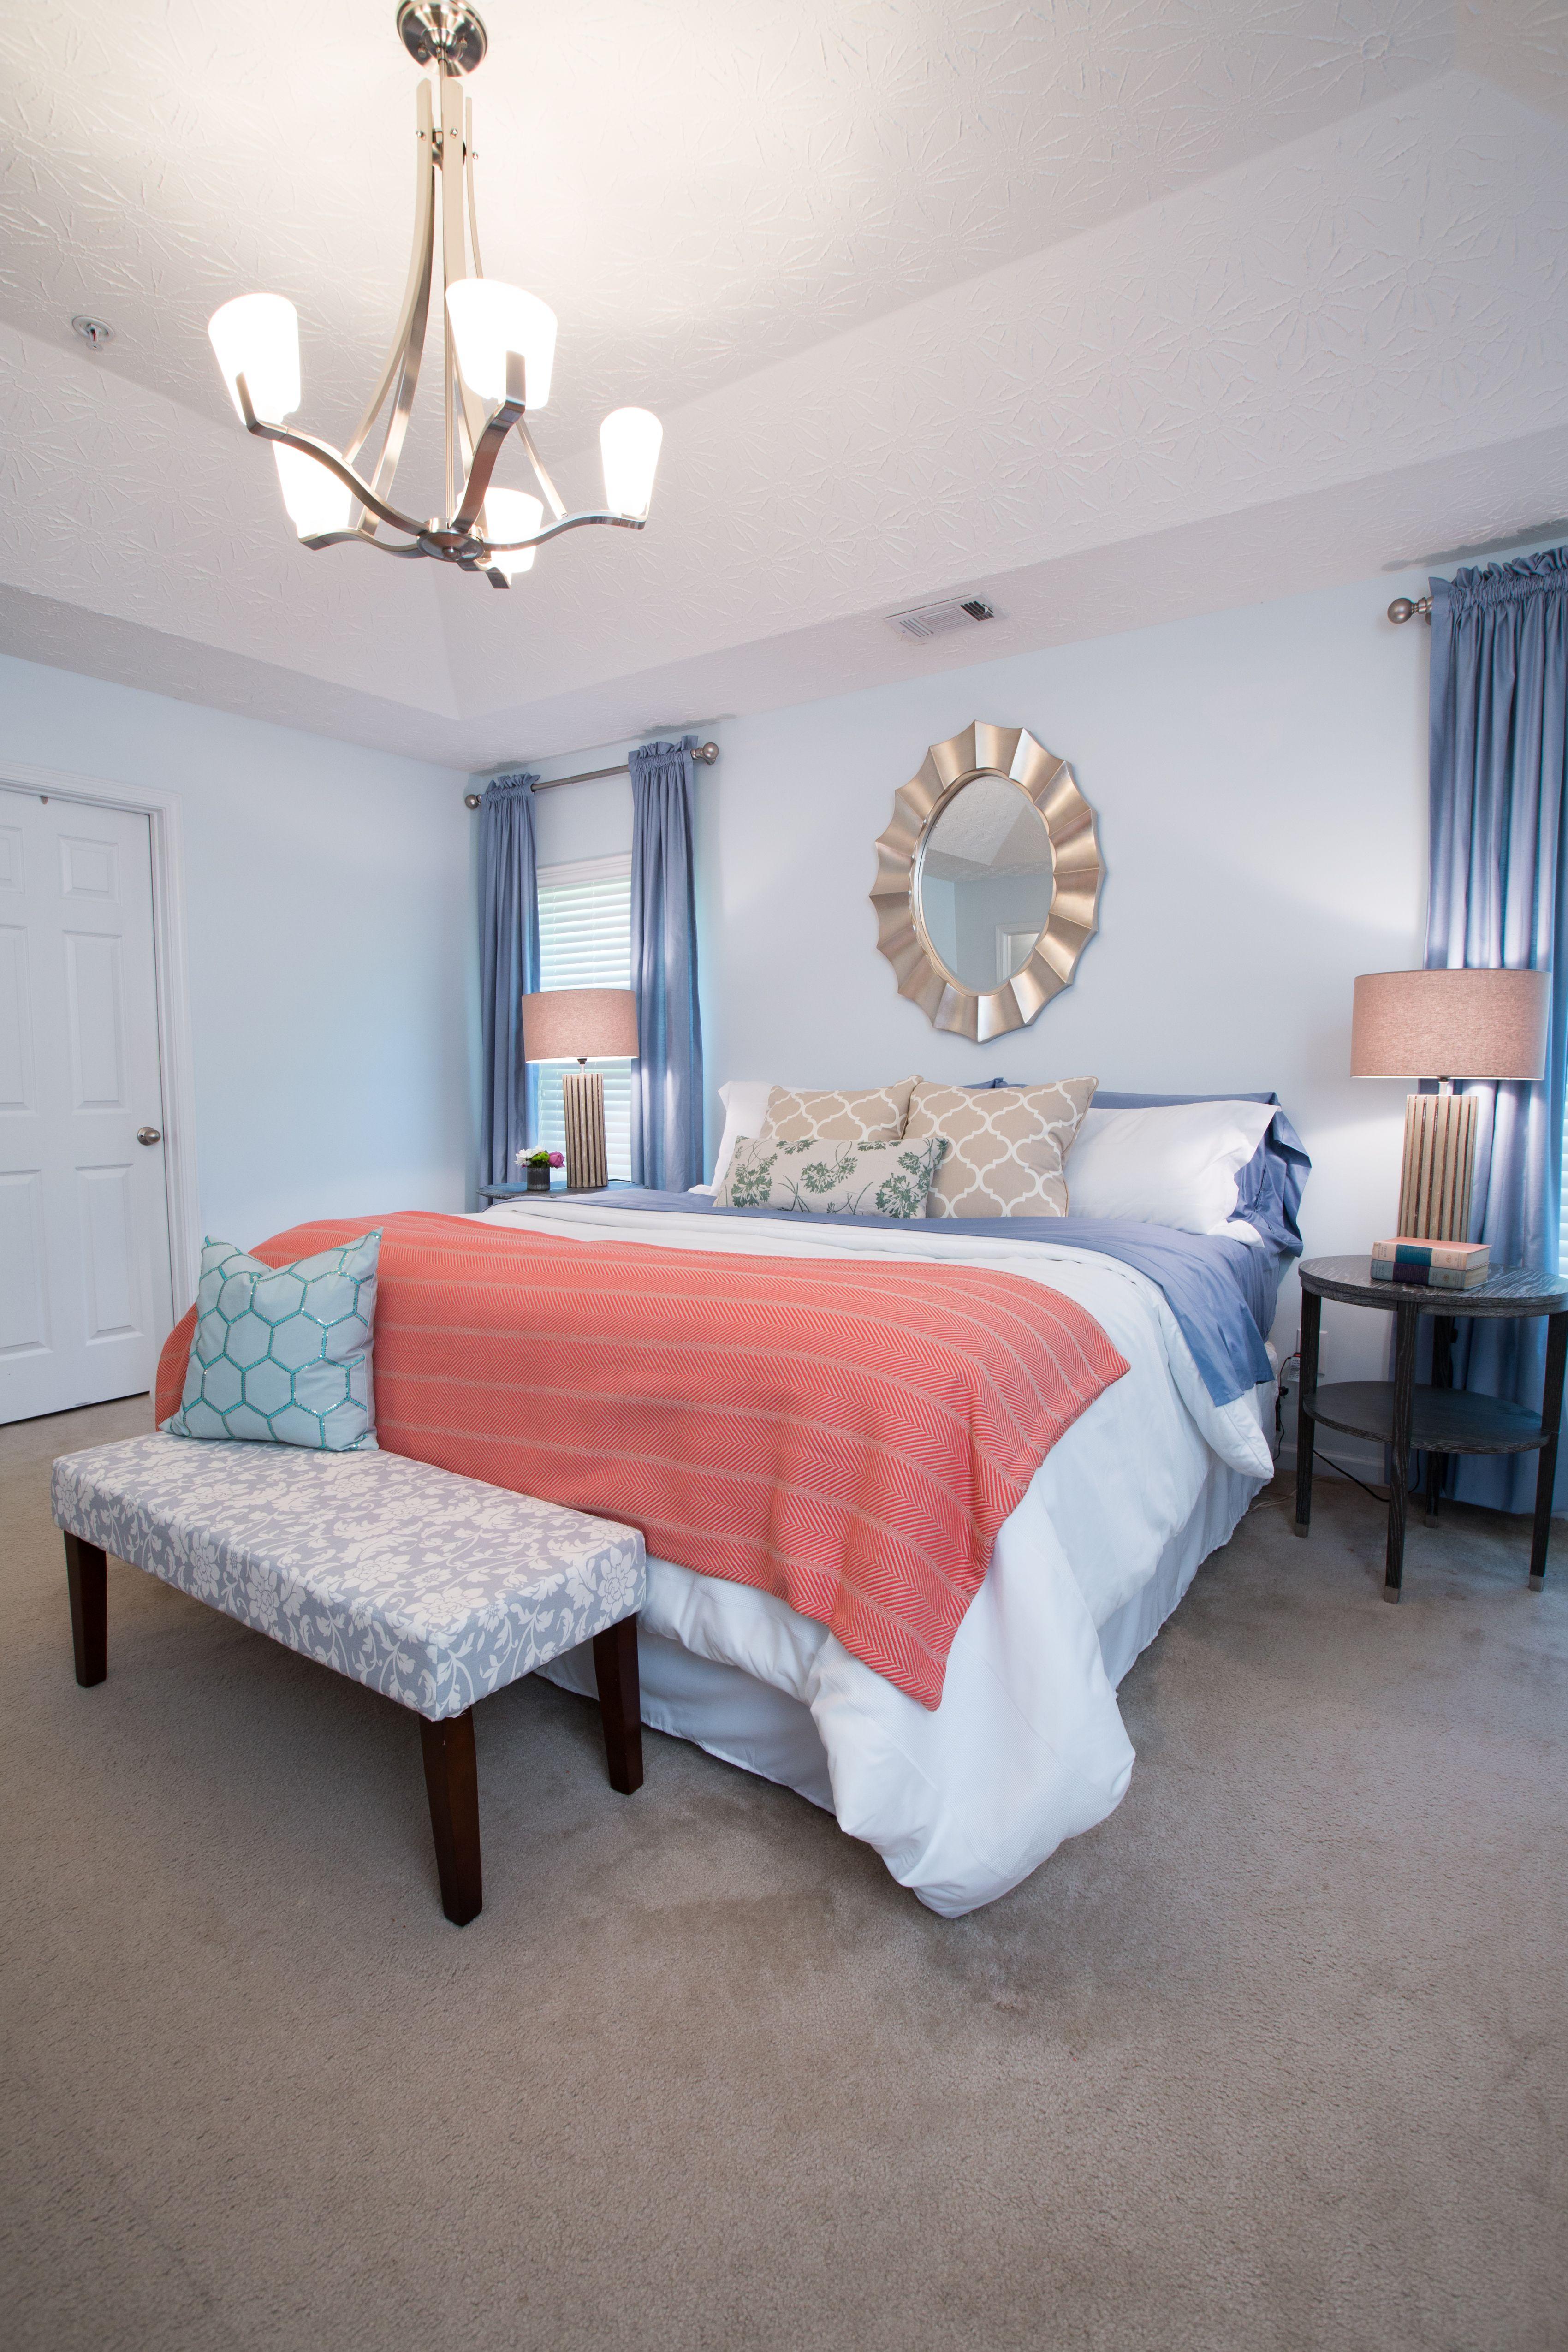 misty eric s master bedroom reveal buying selling master rh pinterest com